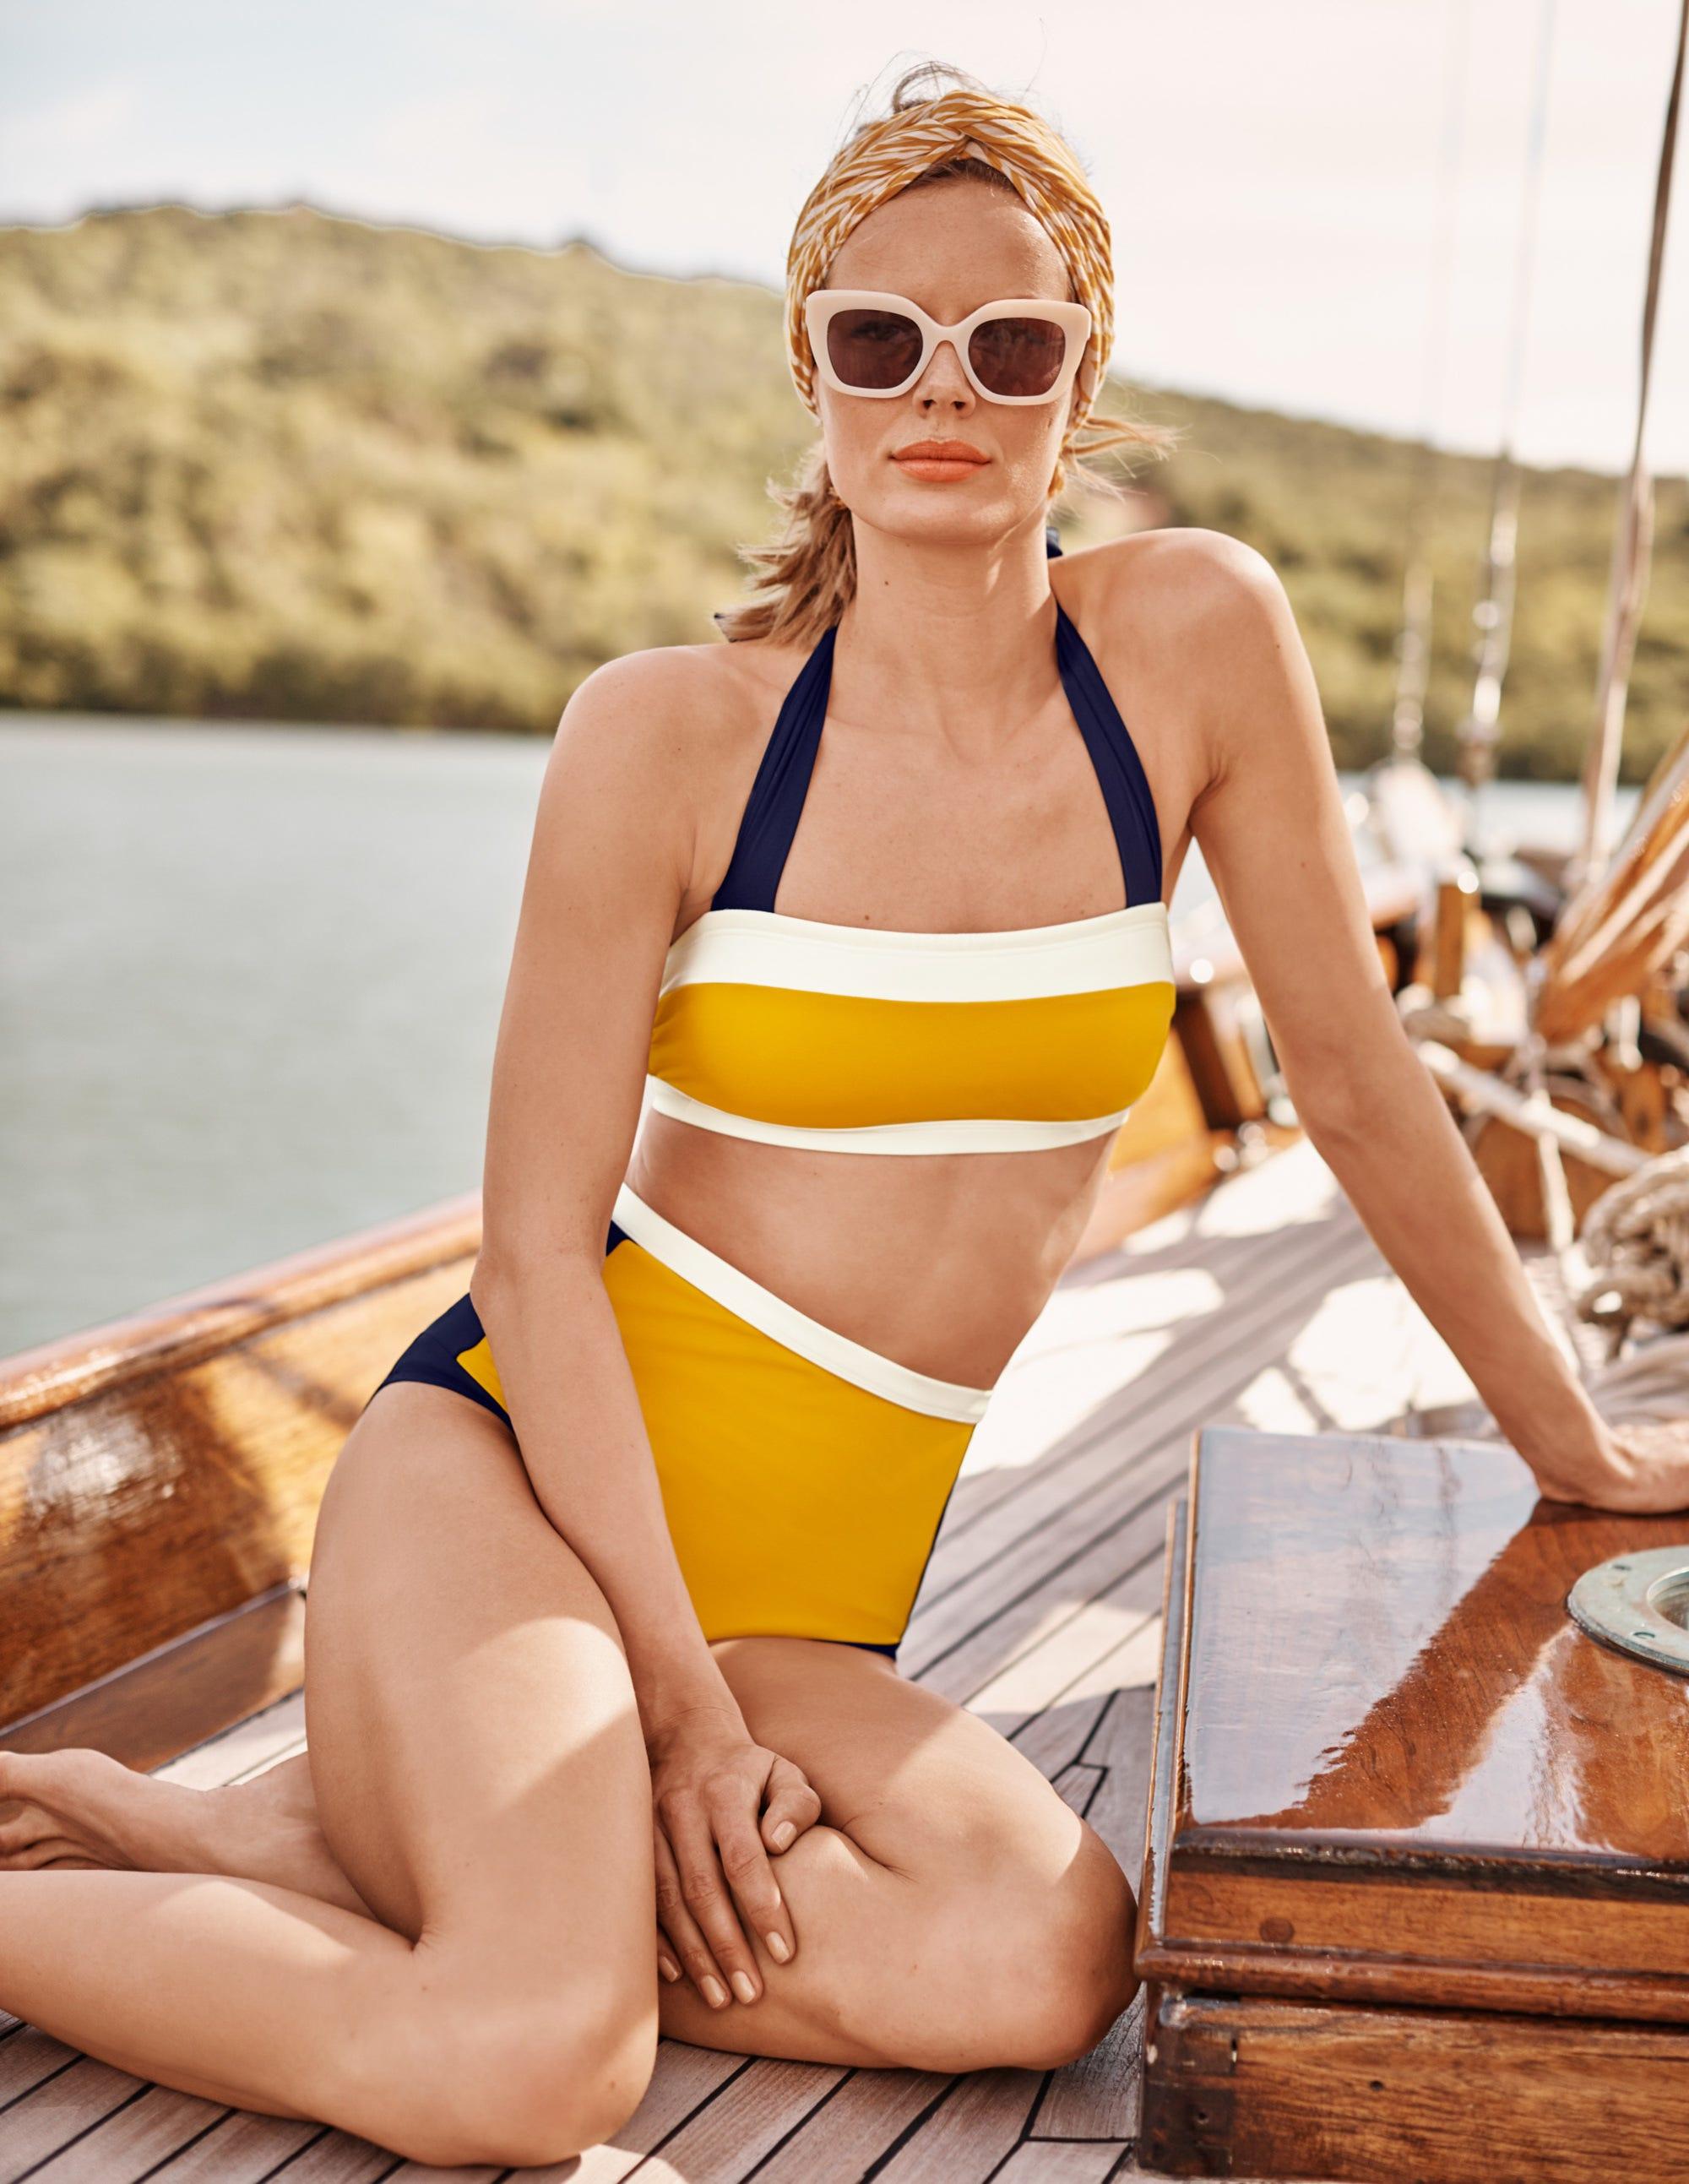 Boden Santorini Bikini Top - Ginger Colourblock